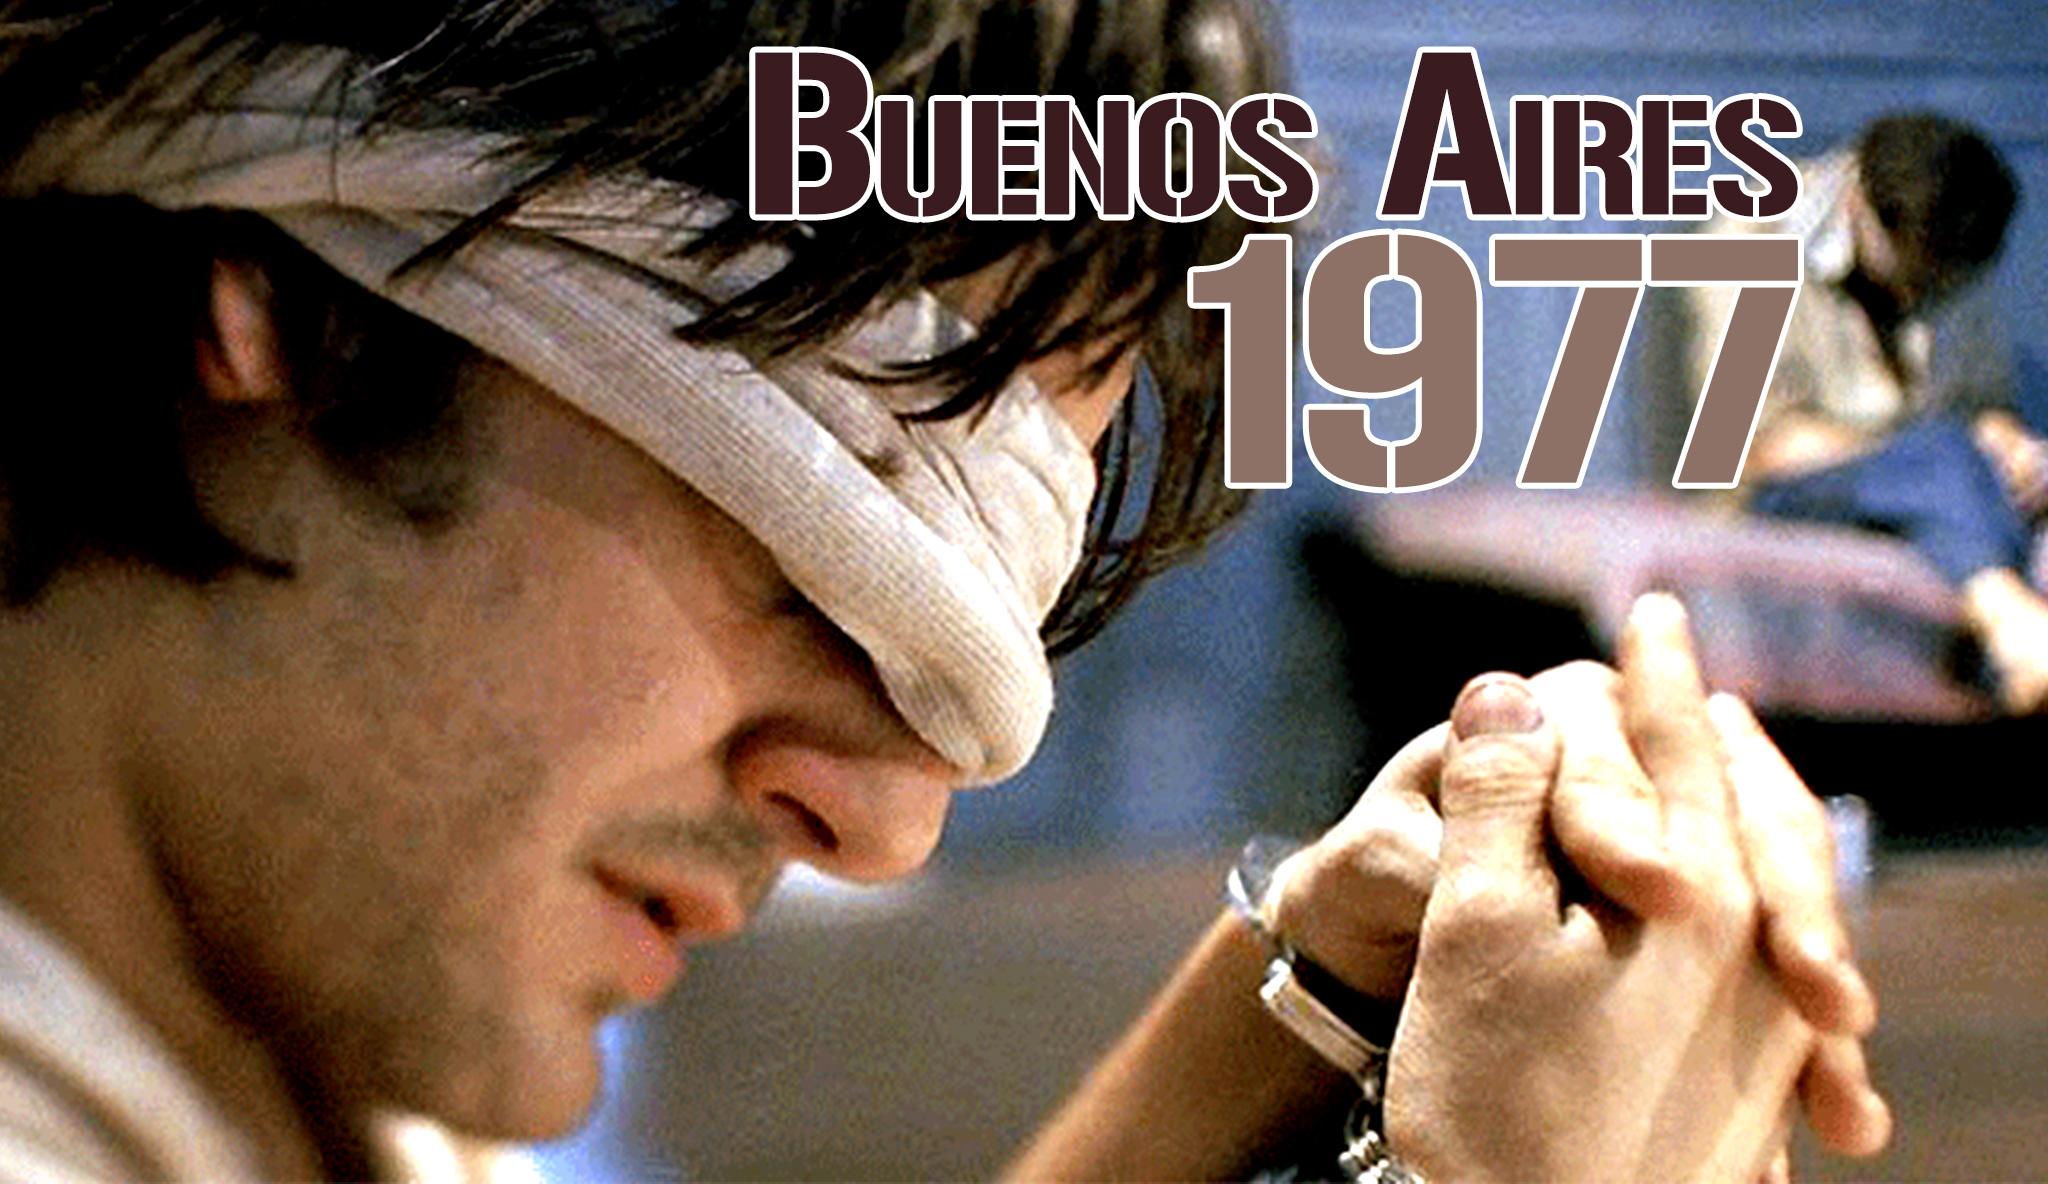 buenos-aires-1977\header.jpg